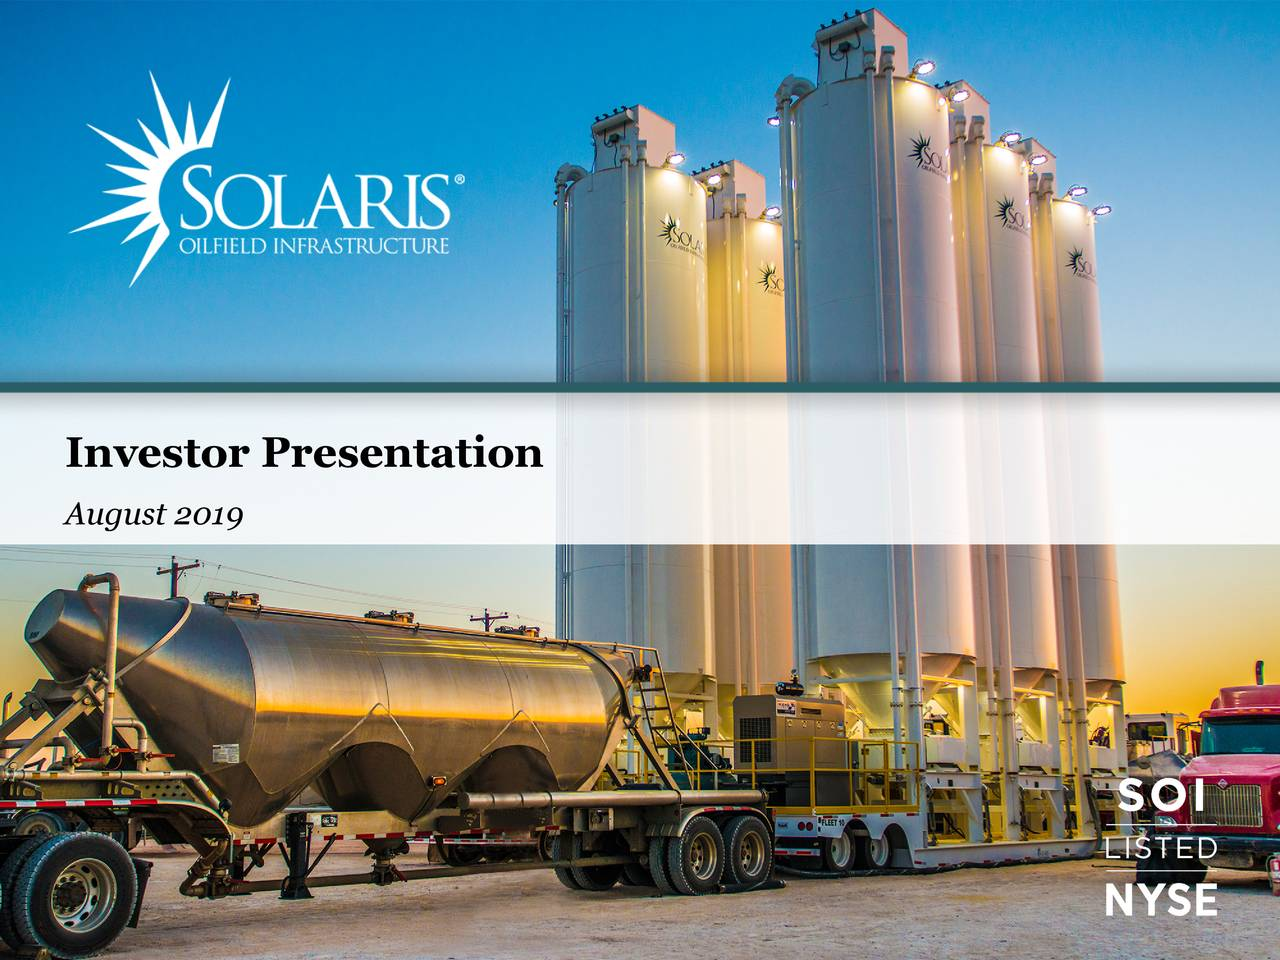 Solaris Oilfield Infrastructure (SOI) Investor Presentation - Slideshow